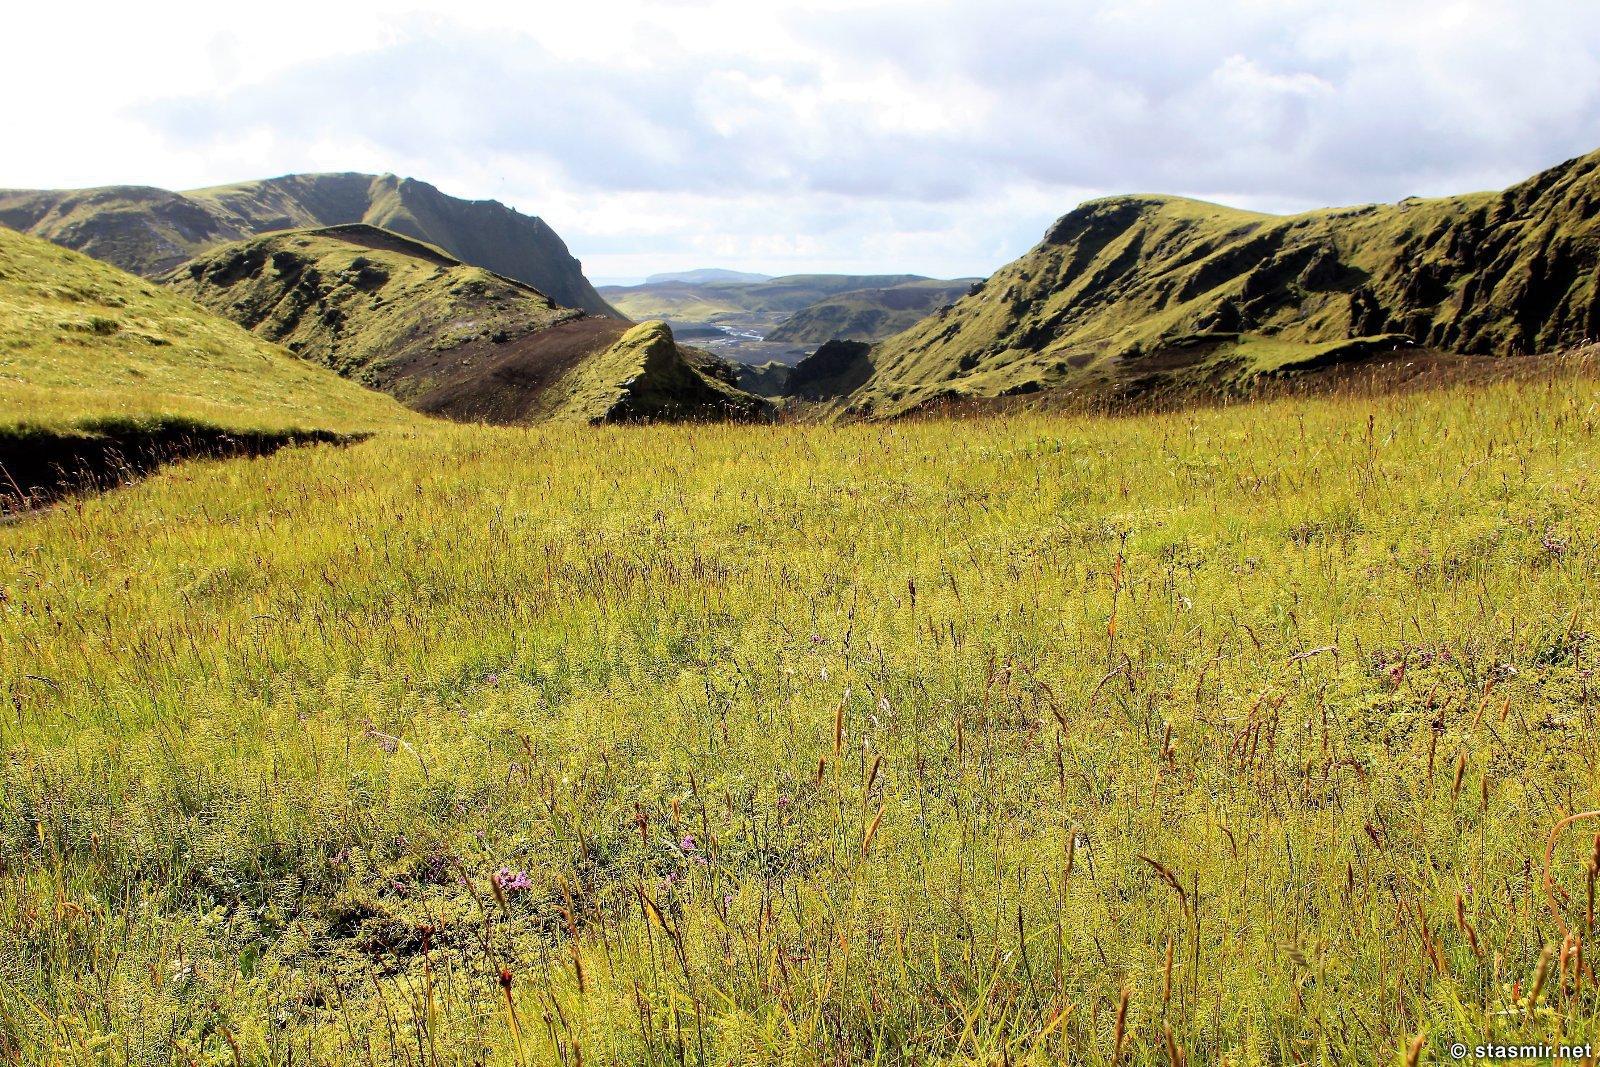 зеленые луга по маршруту Такгил, Такгиль, Þakgíl, фото Стасмир, photo Stasmir